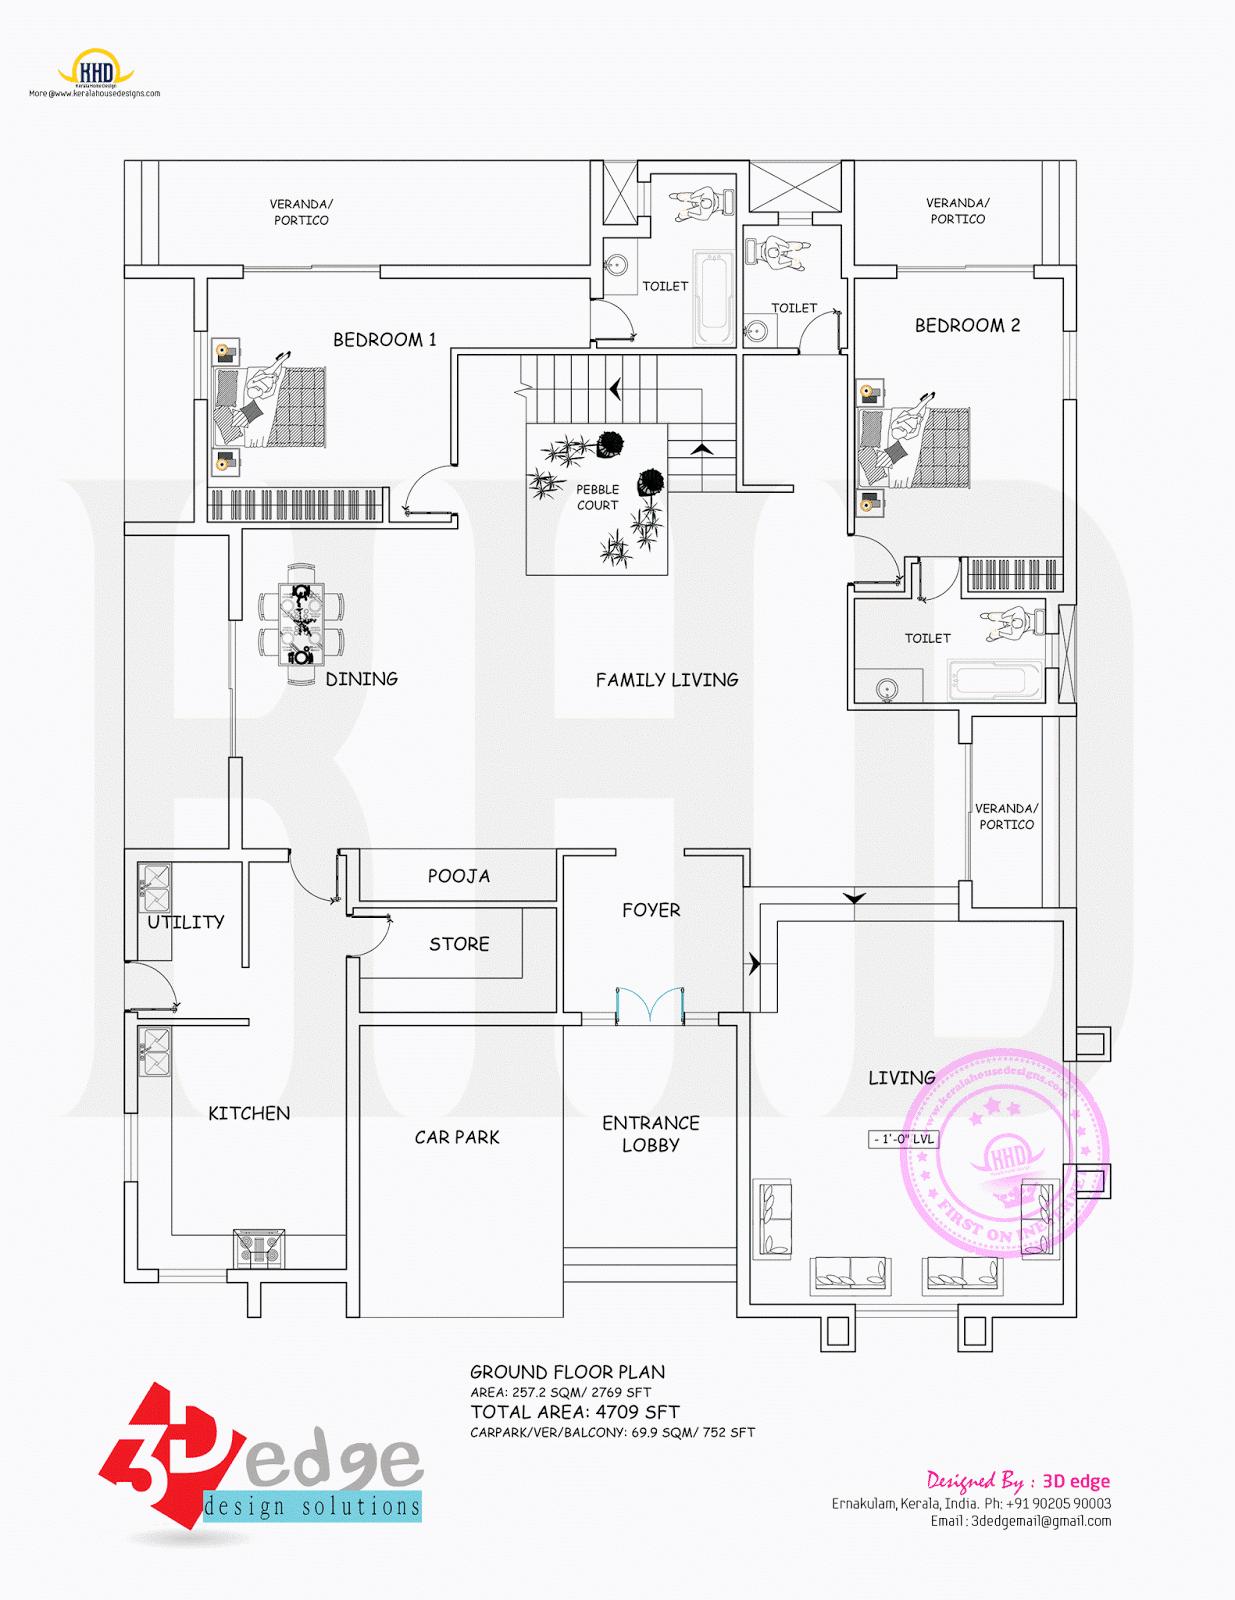 Ground Floor Elevation Plan : Modern house elevation and plan kerala home design